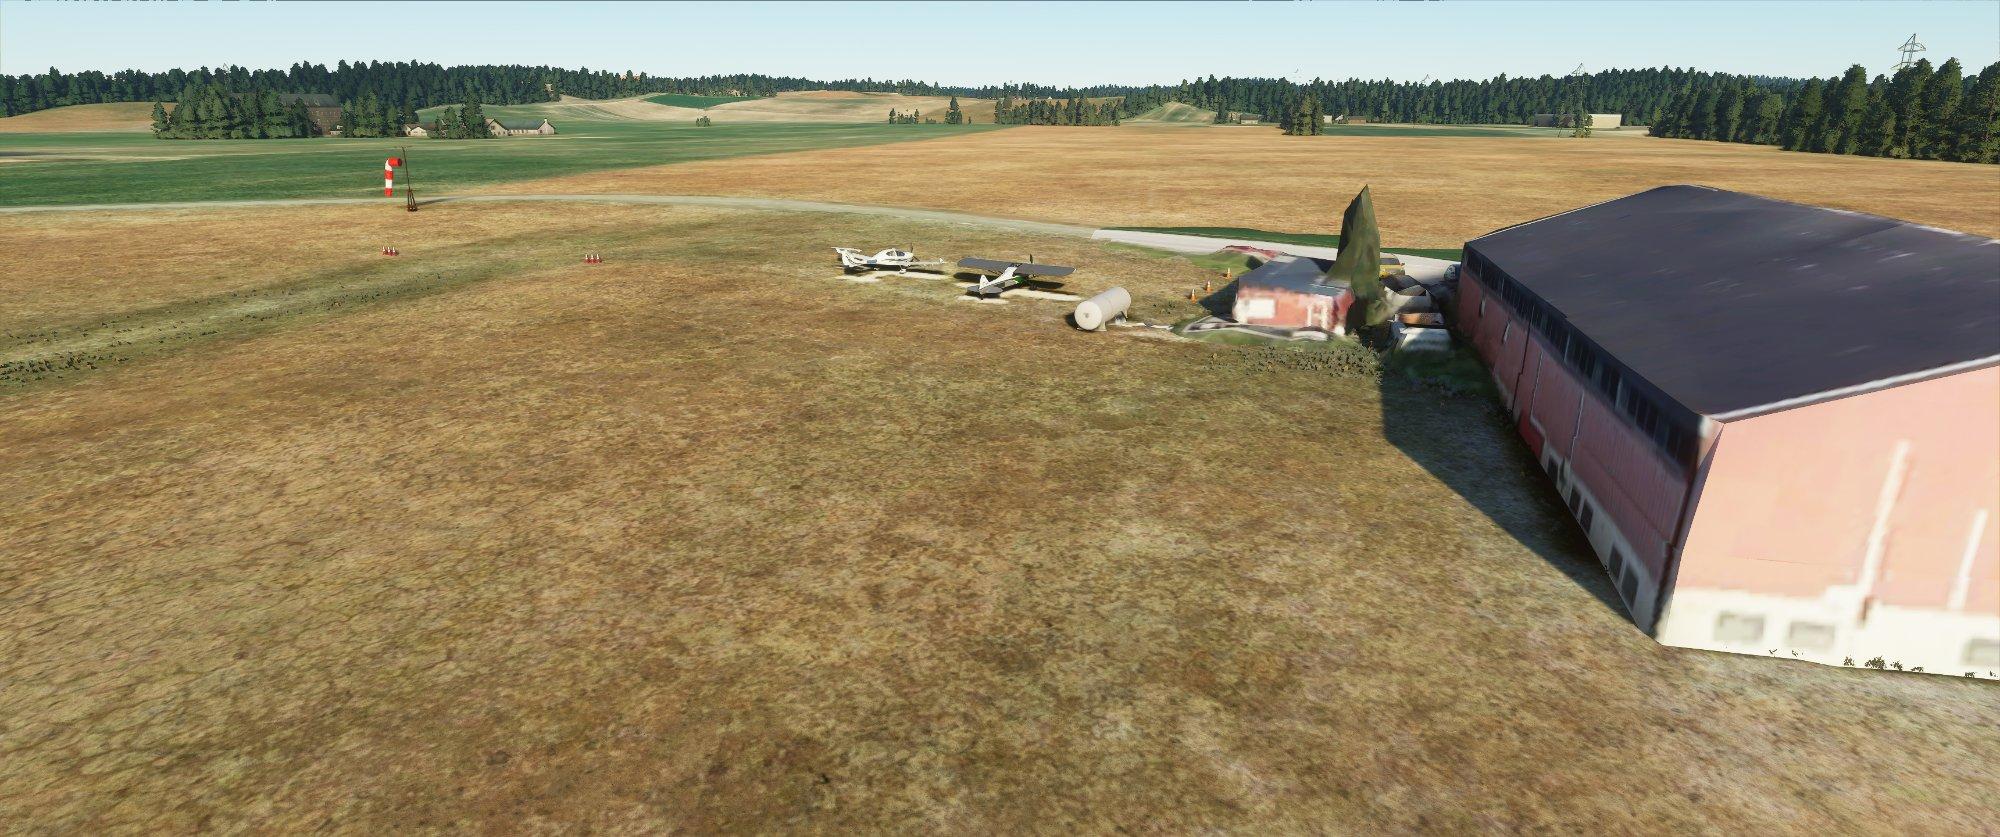 Microsoft Flight Simulator Screenshot 2020.10.23 - 15.24.50.80.jpg